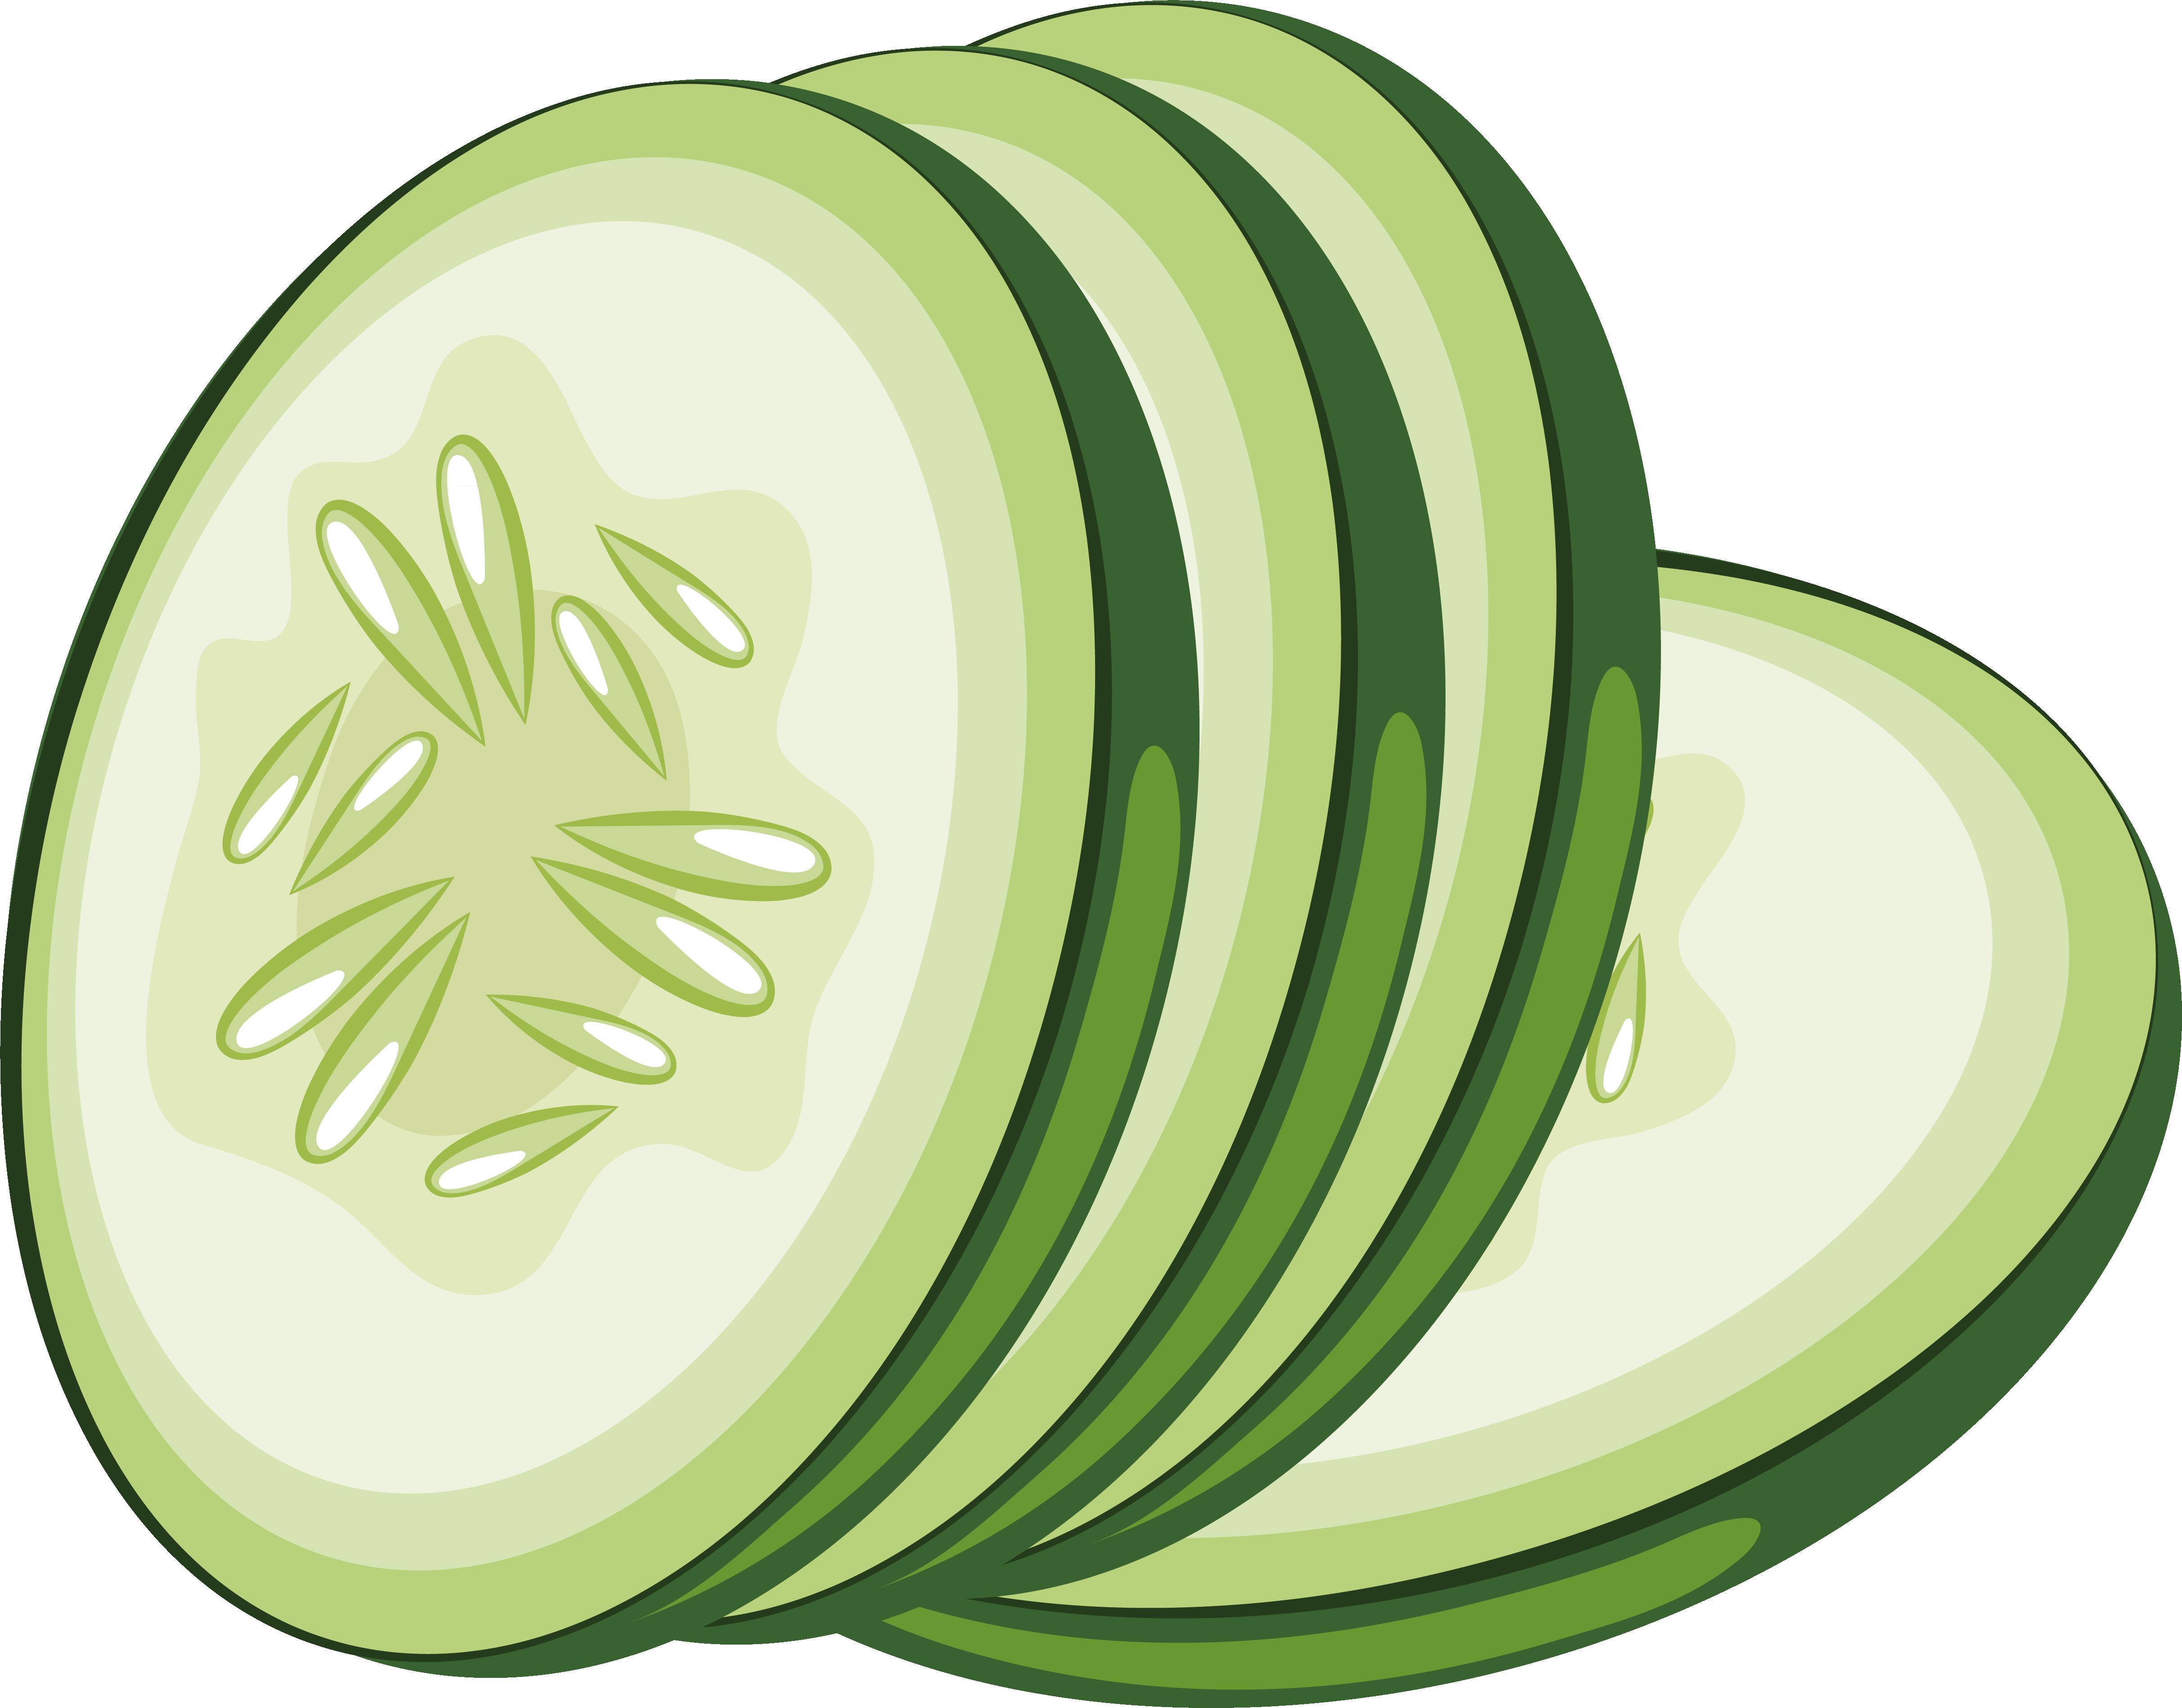 Lime clipart cucumber slice. Vegetable icon design transprent